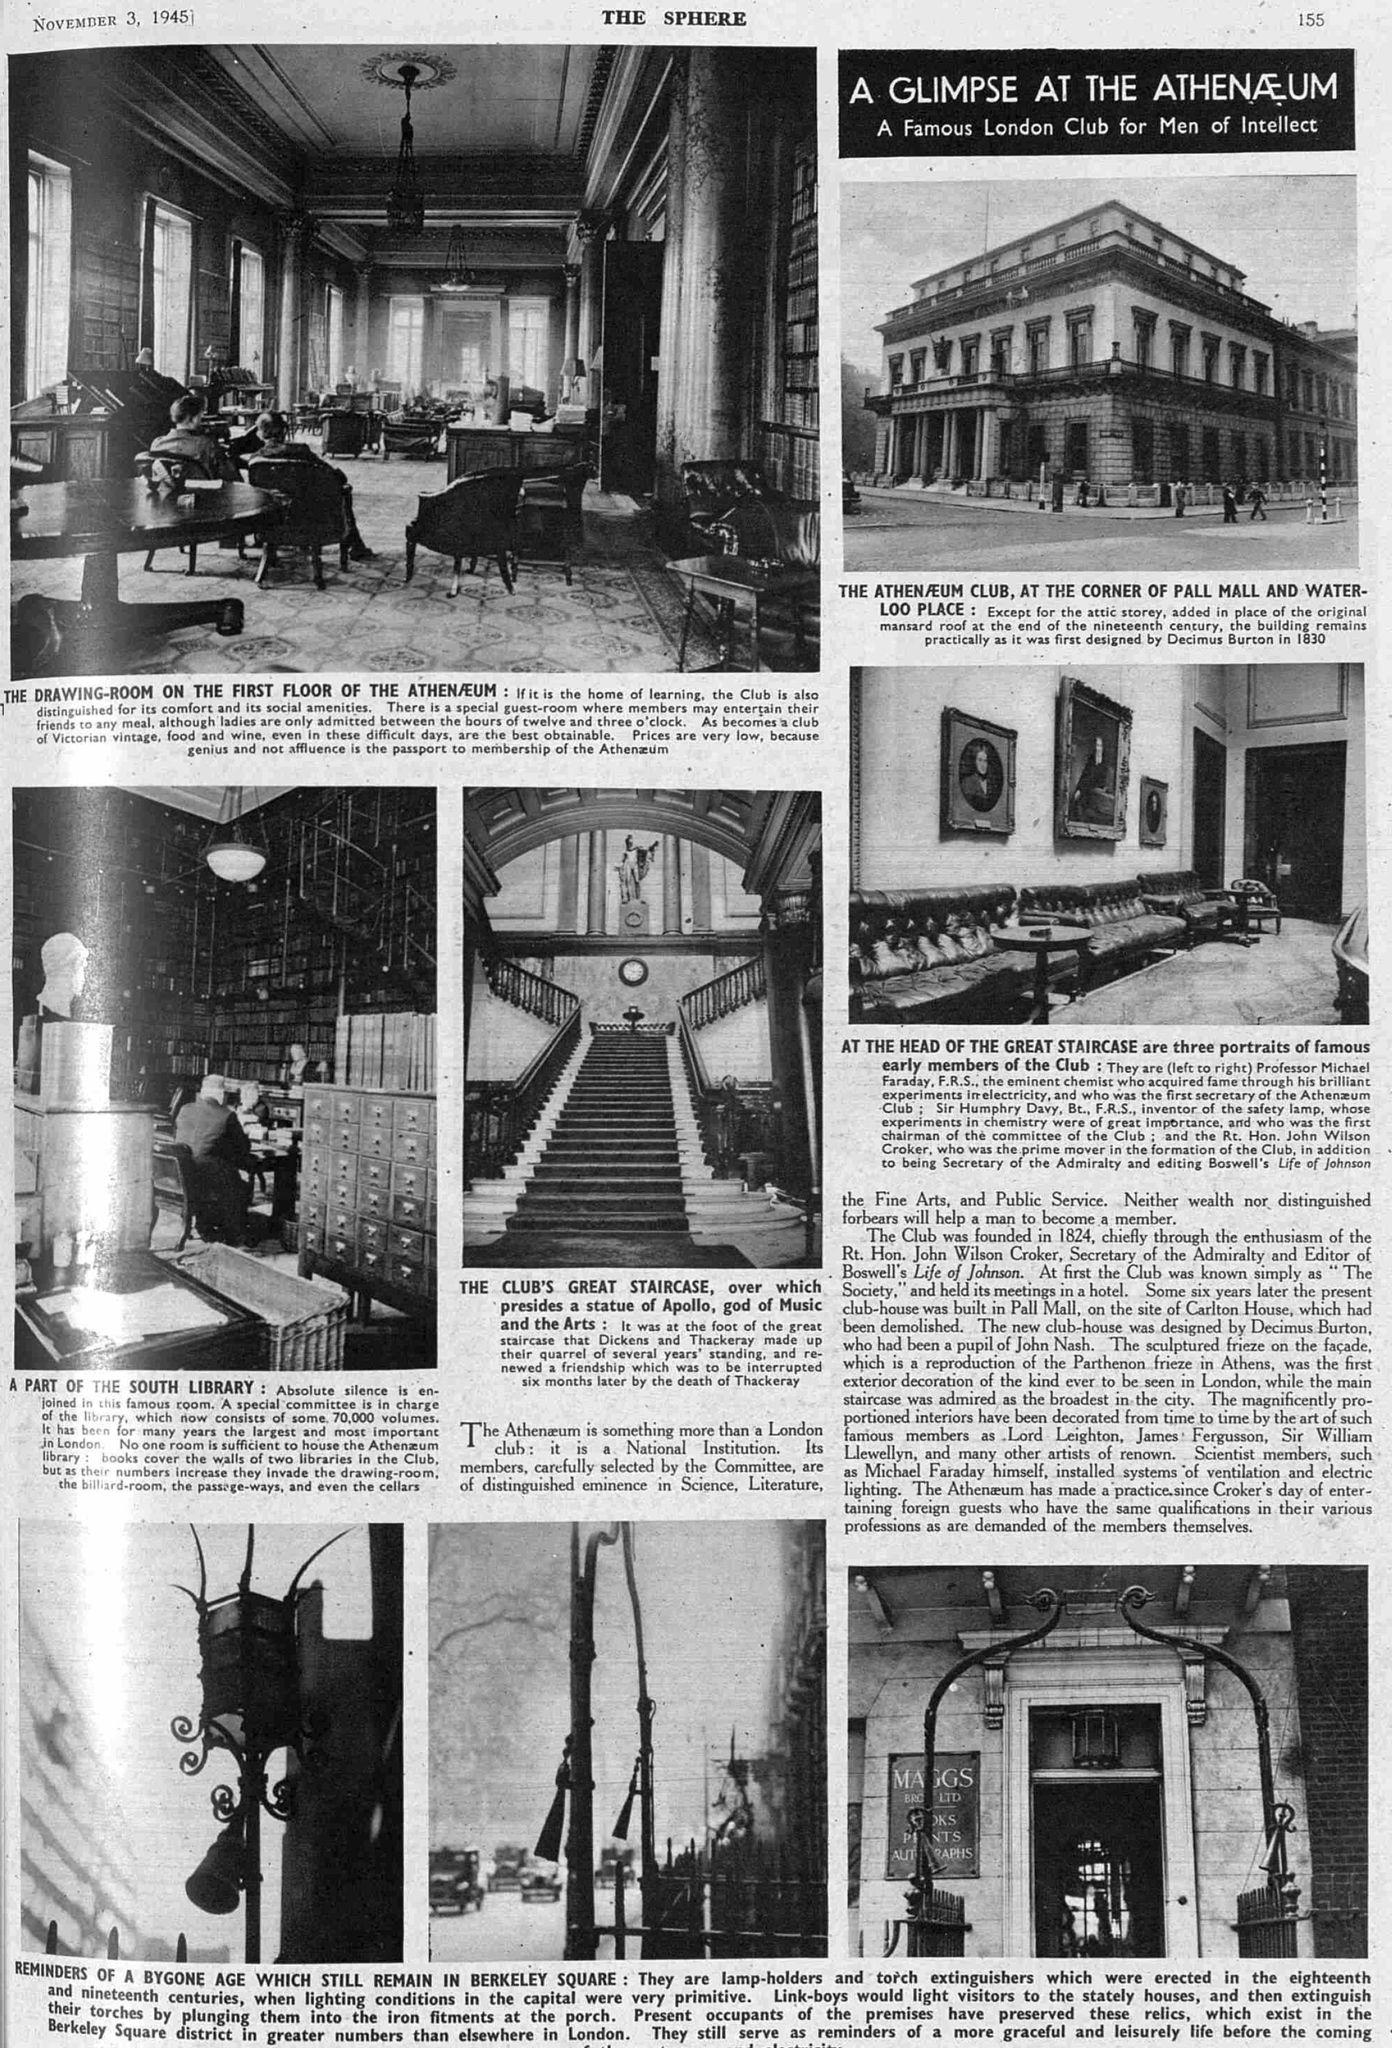 The Athenaeum Club 1945: The Sphere p1.55